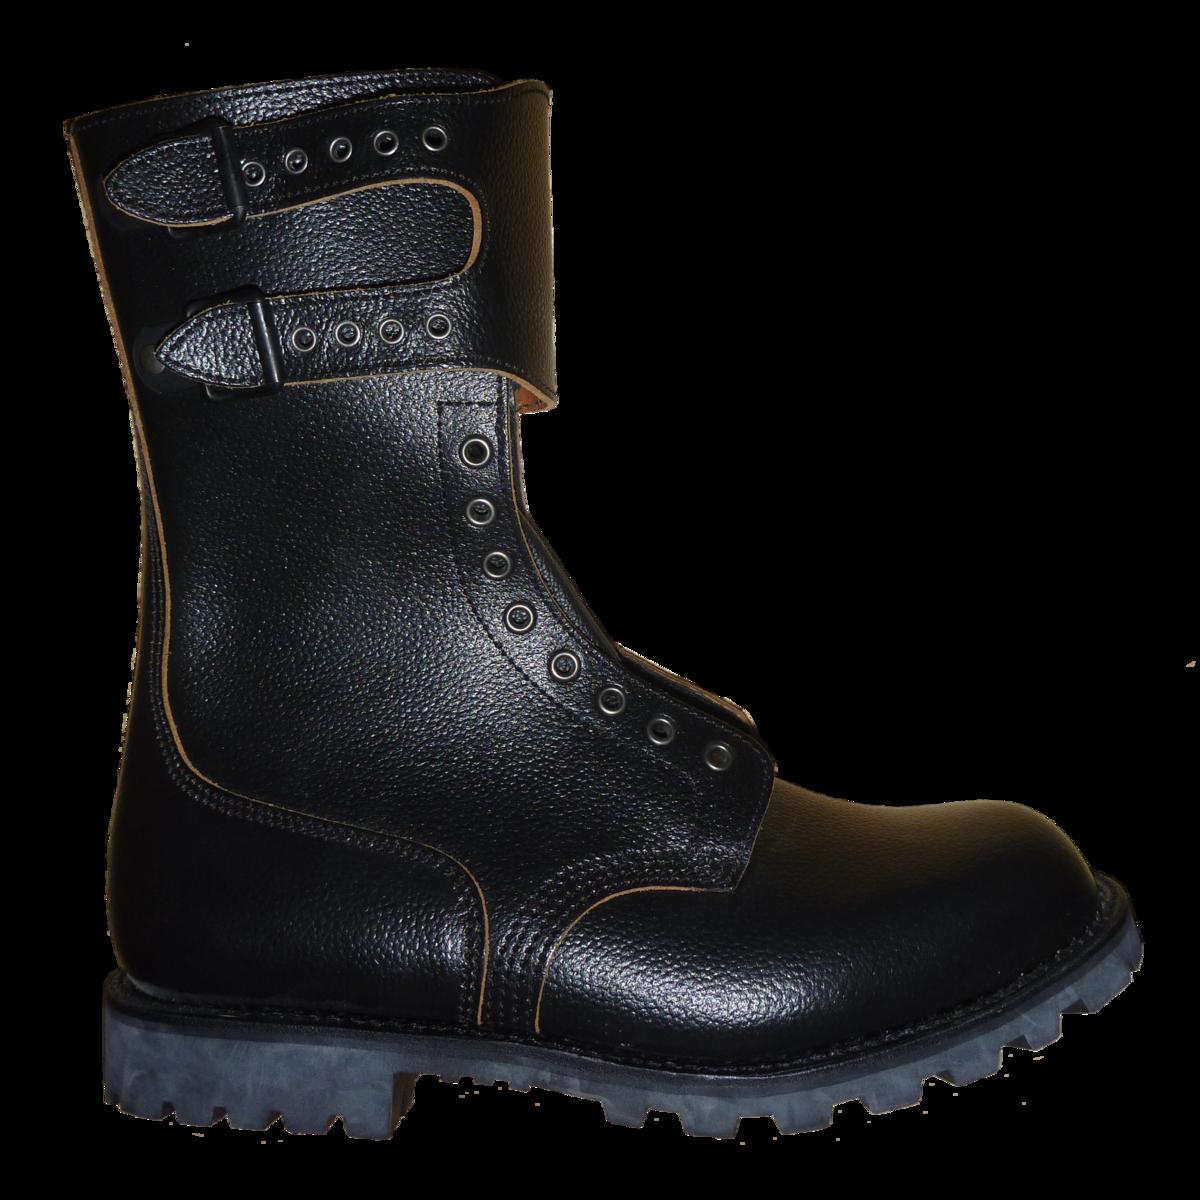 Rangers (chaussure) — Wikipédia